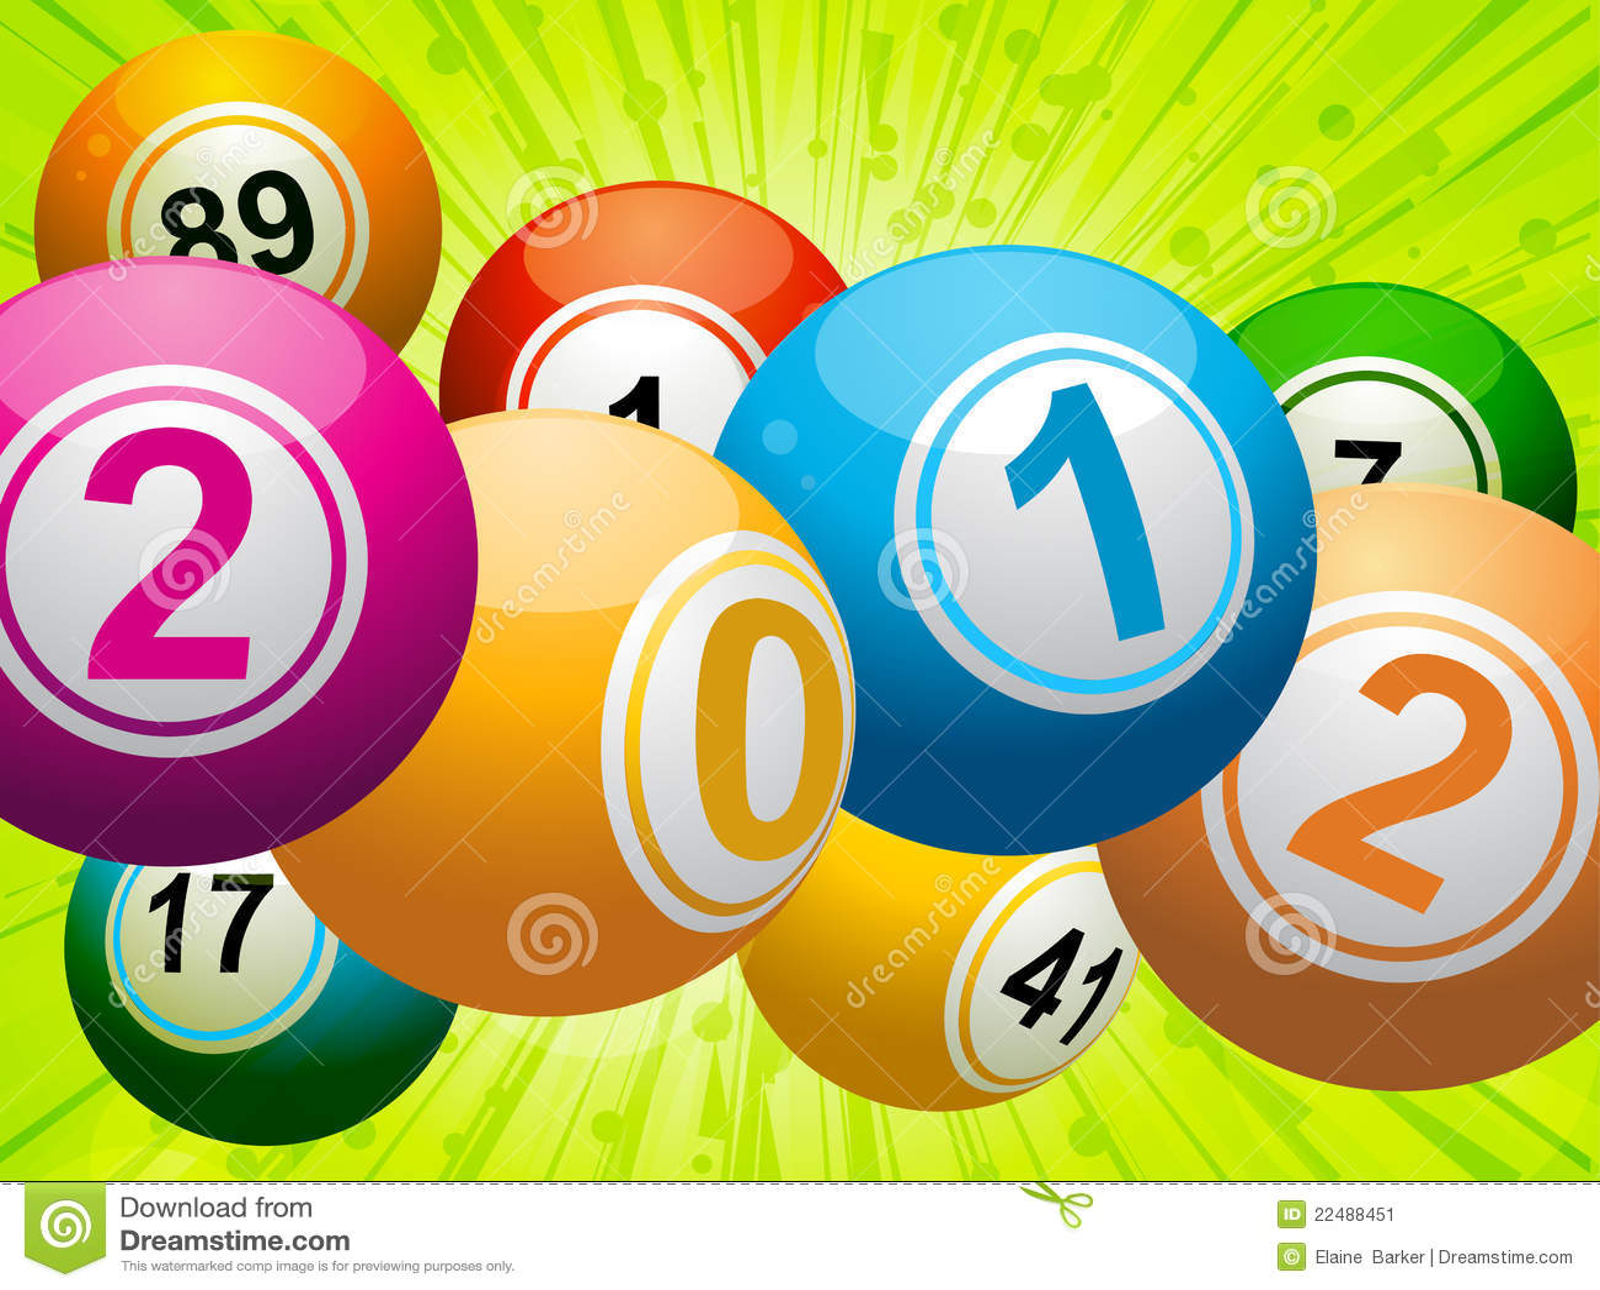 virgin 1 lotto bingo